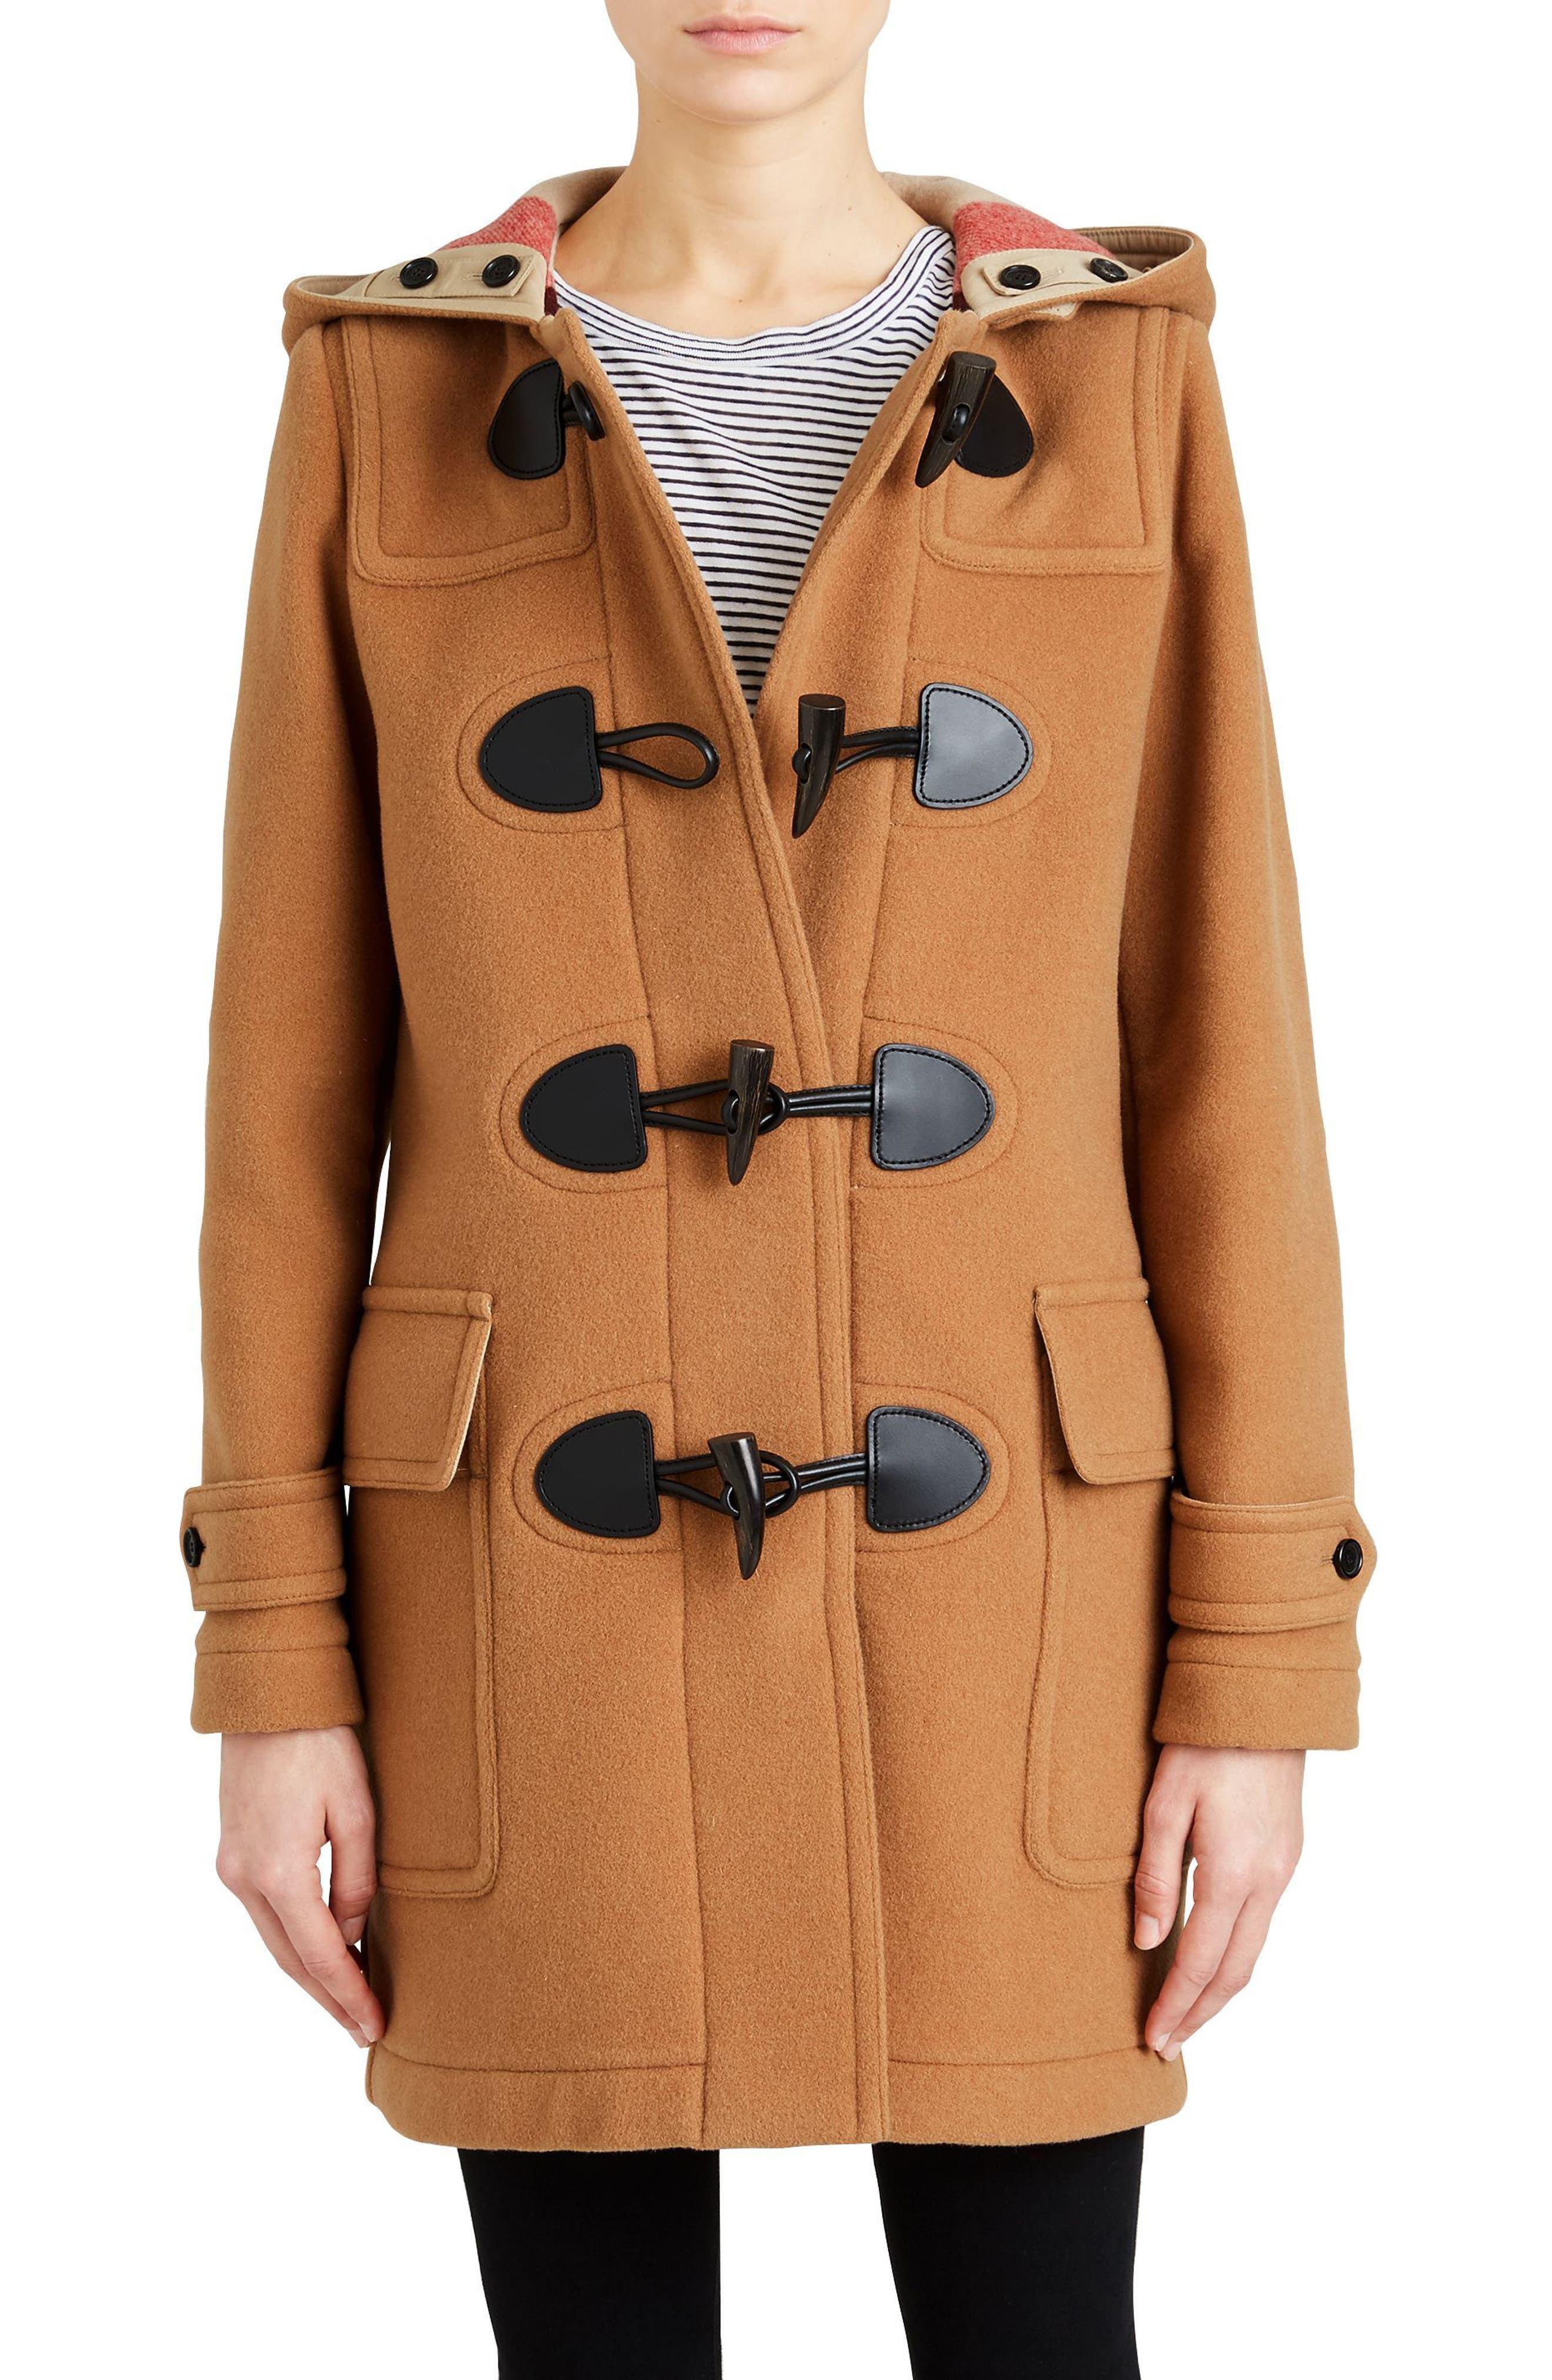 Mersey Wool Blend Duffle Coat,                         Main,                         color, Mid Camel